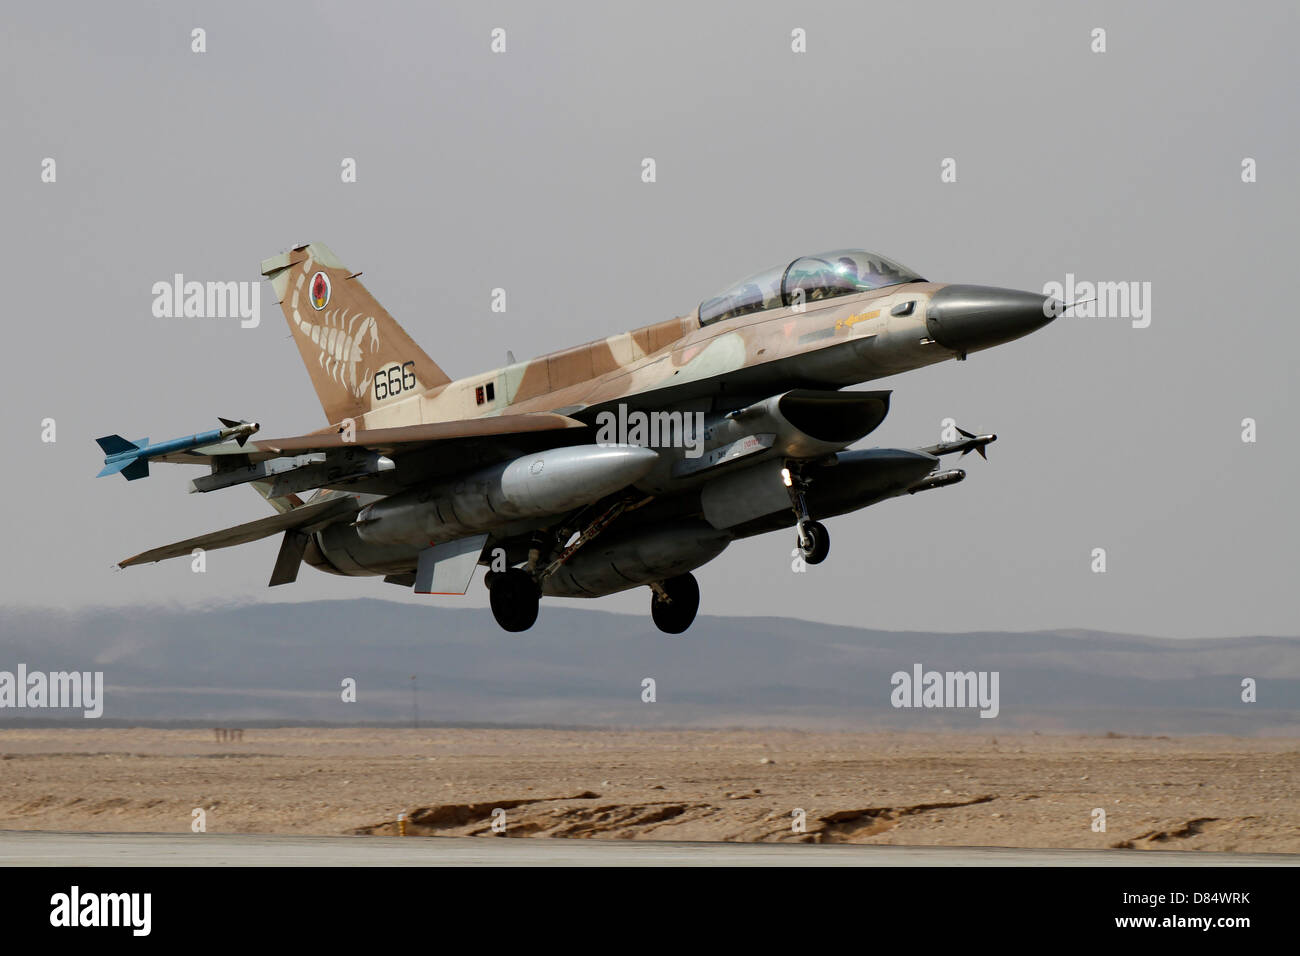 An F-16D Barak of the Israeli Air Force landing at Ovda Air Force Base, Israel. - Stock Image